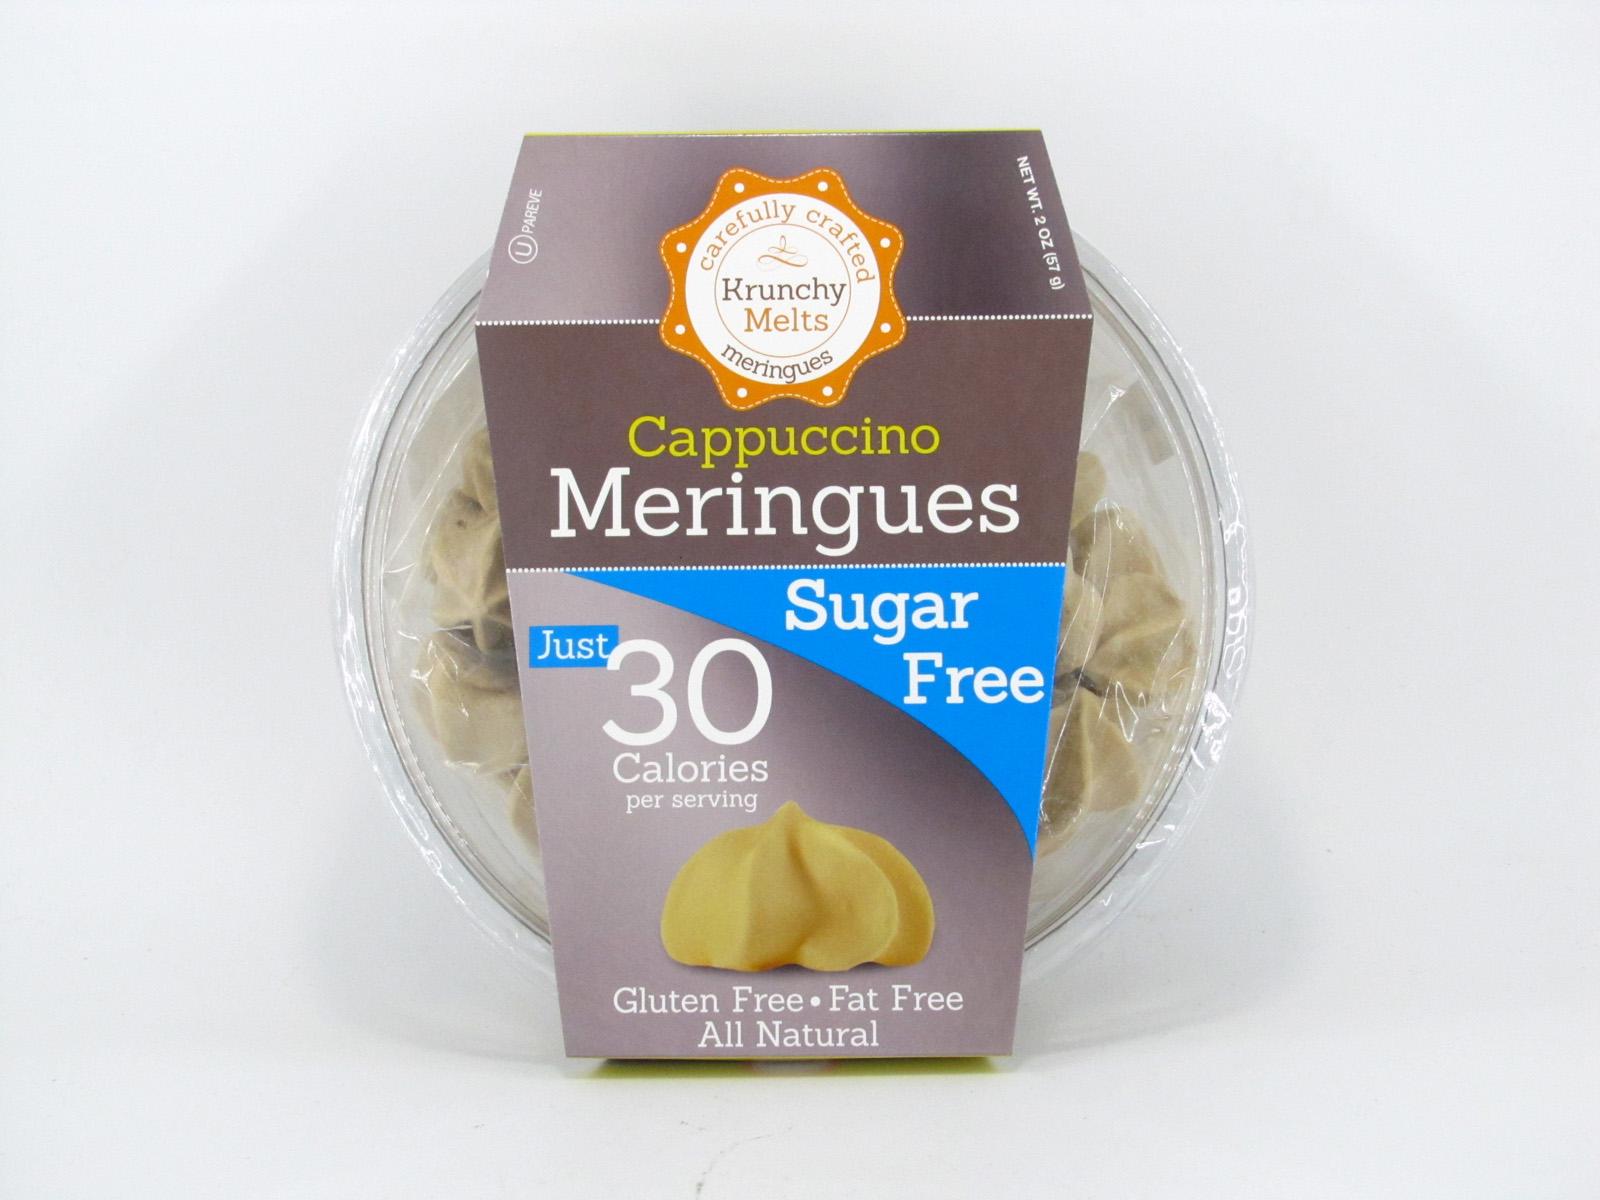 Krunchy Melts Meringues - Cappuccino - front view